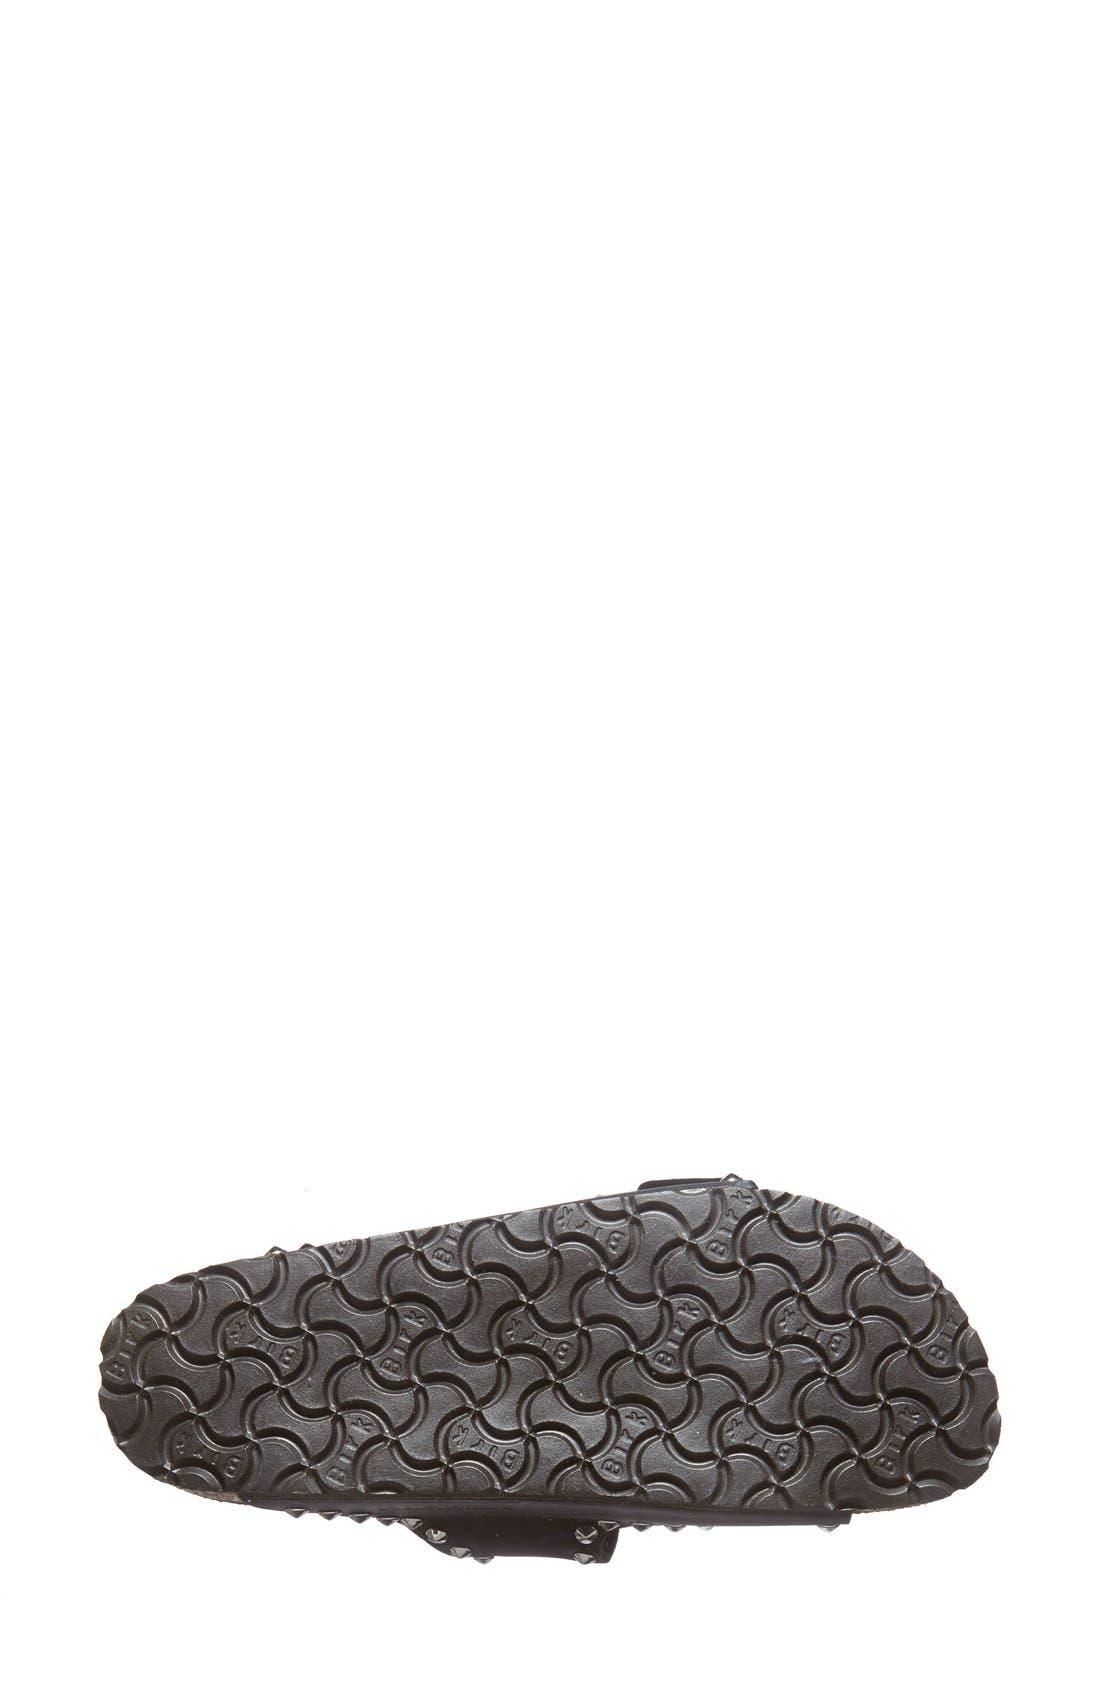 BIRKENSTOCK, 'Arizona' Studded Leather Sandal, Alternate thumbnail 2, color, 001